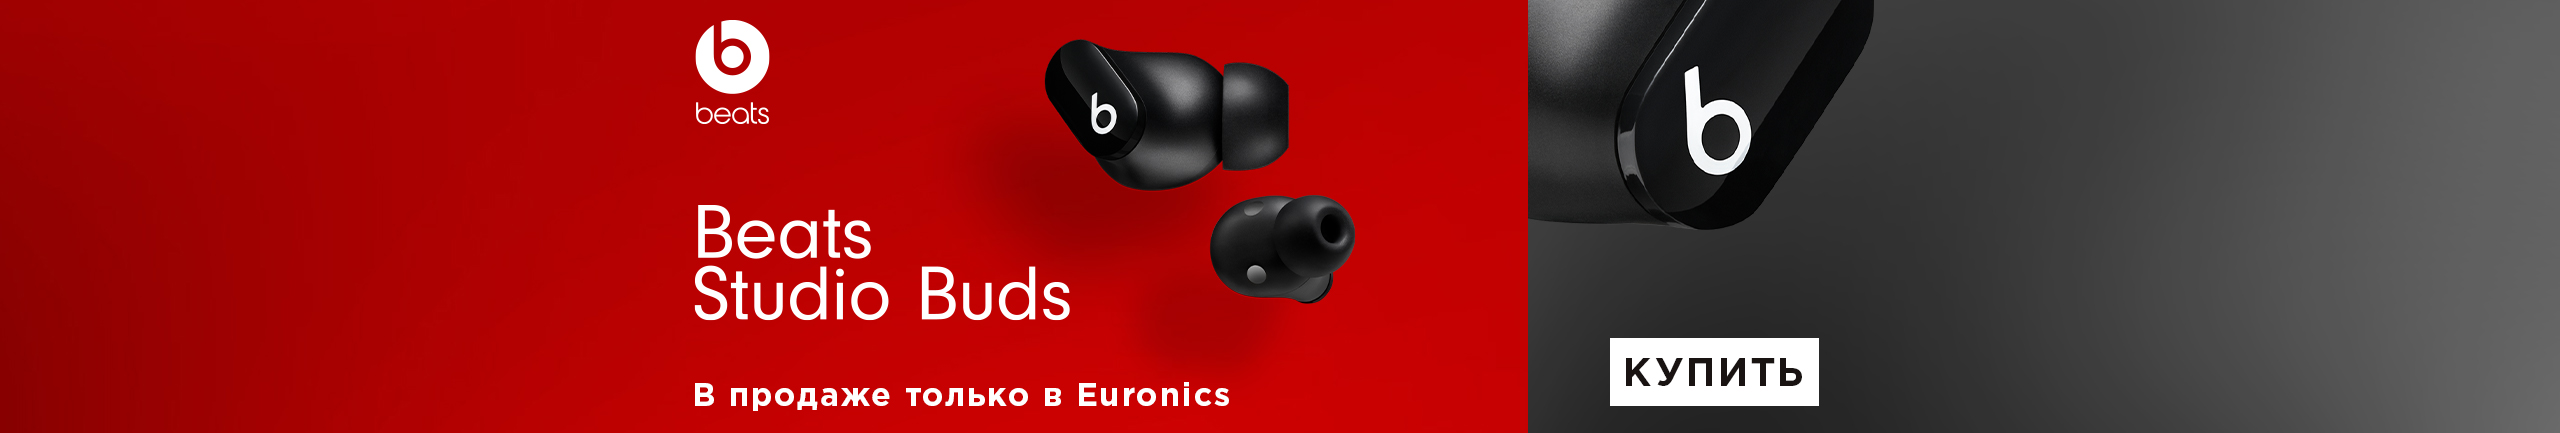 NPL Эксклюзивное предложение в Euronics - наушники Beats Studio